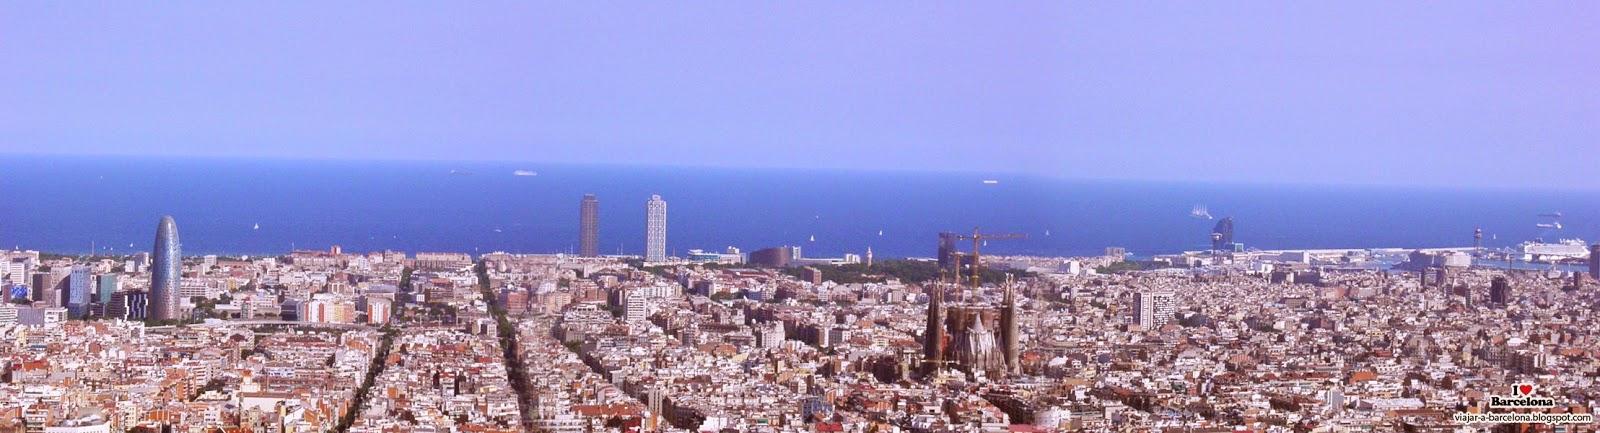 Mirador de Barcelona